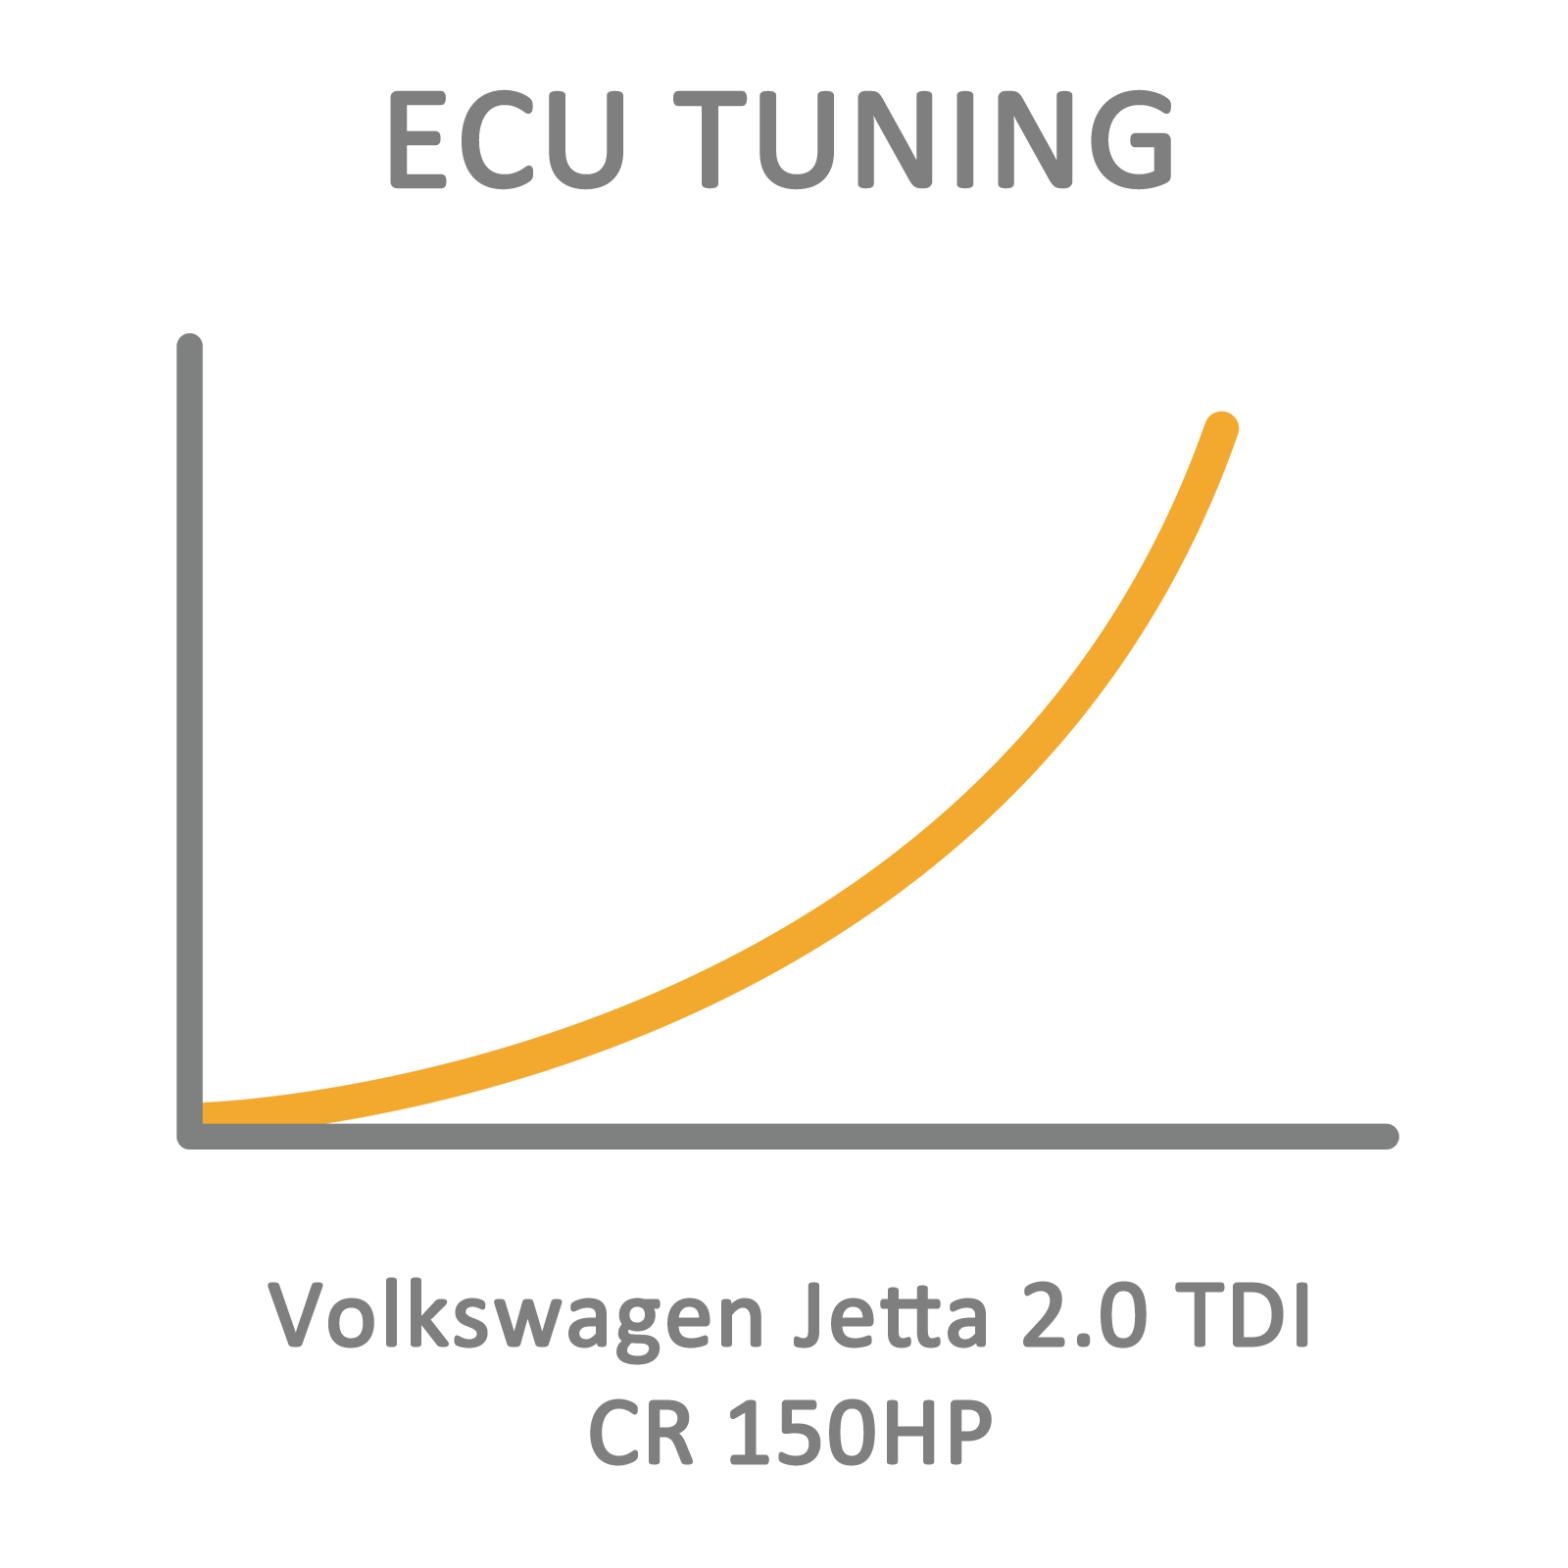 Volkswagen Jetta 2.0 TDI CR 150HP ECU Tuning Remapping